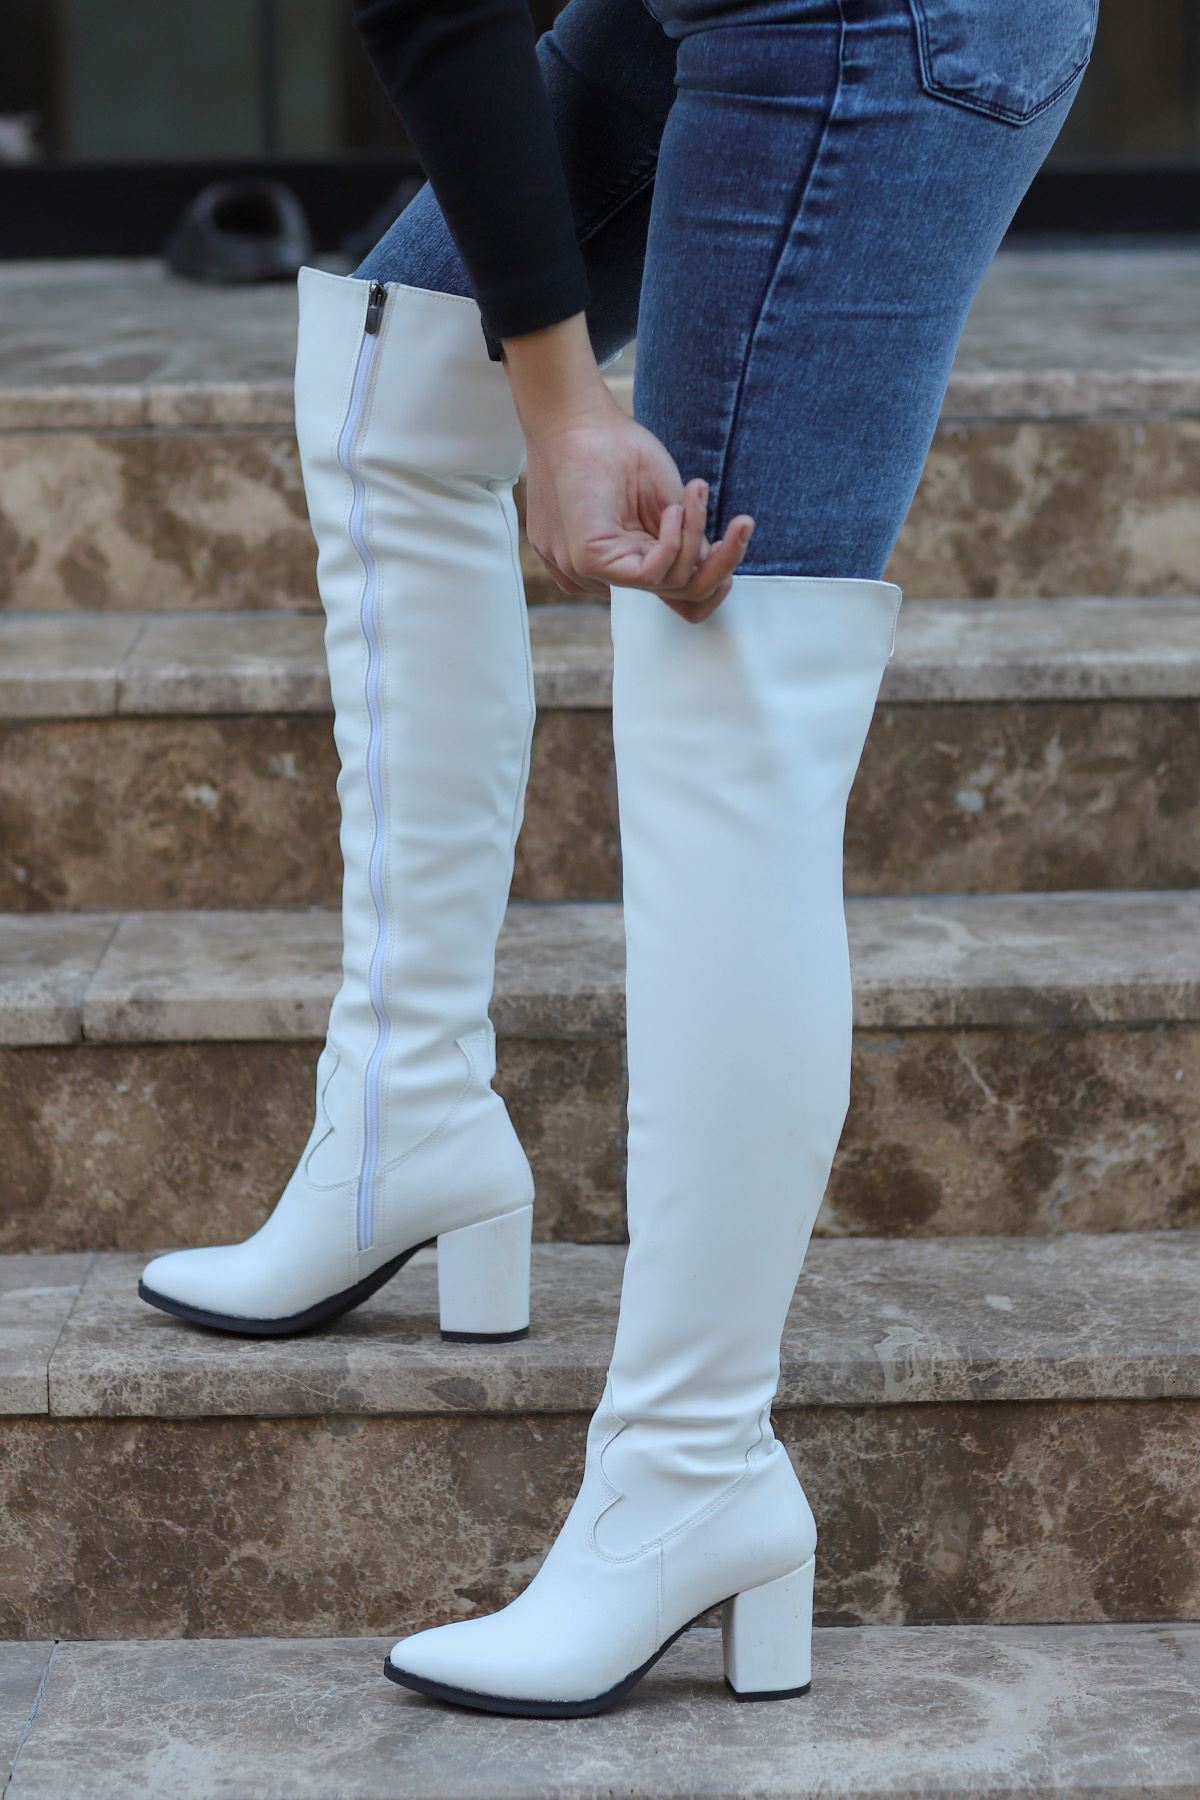 mami-7110 Kovboy Diz Üstü Çizme Beyaz Deri